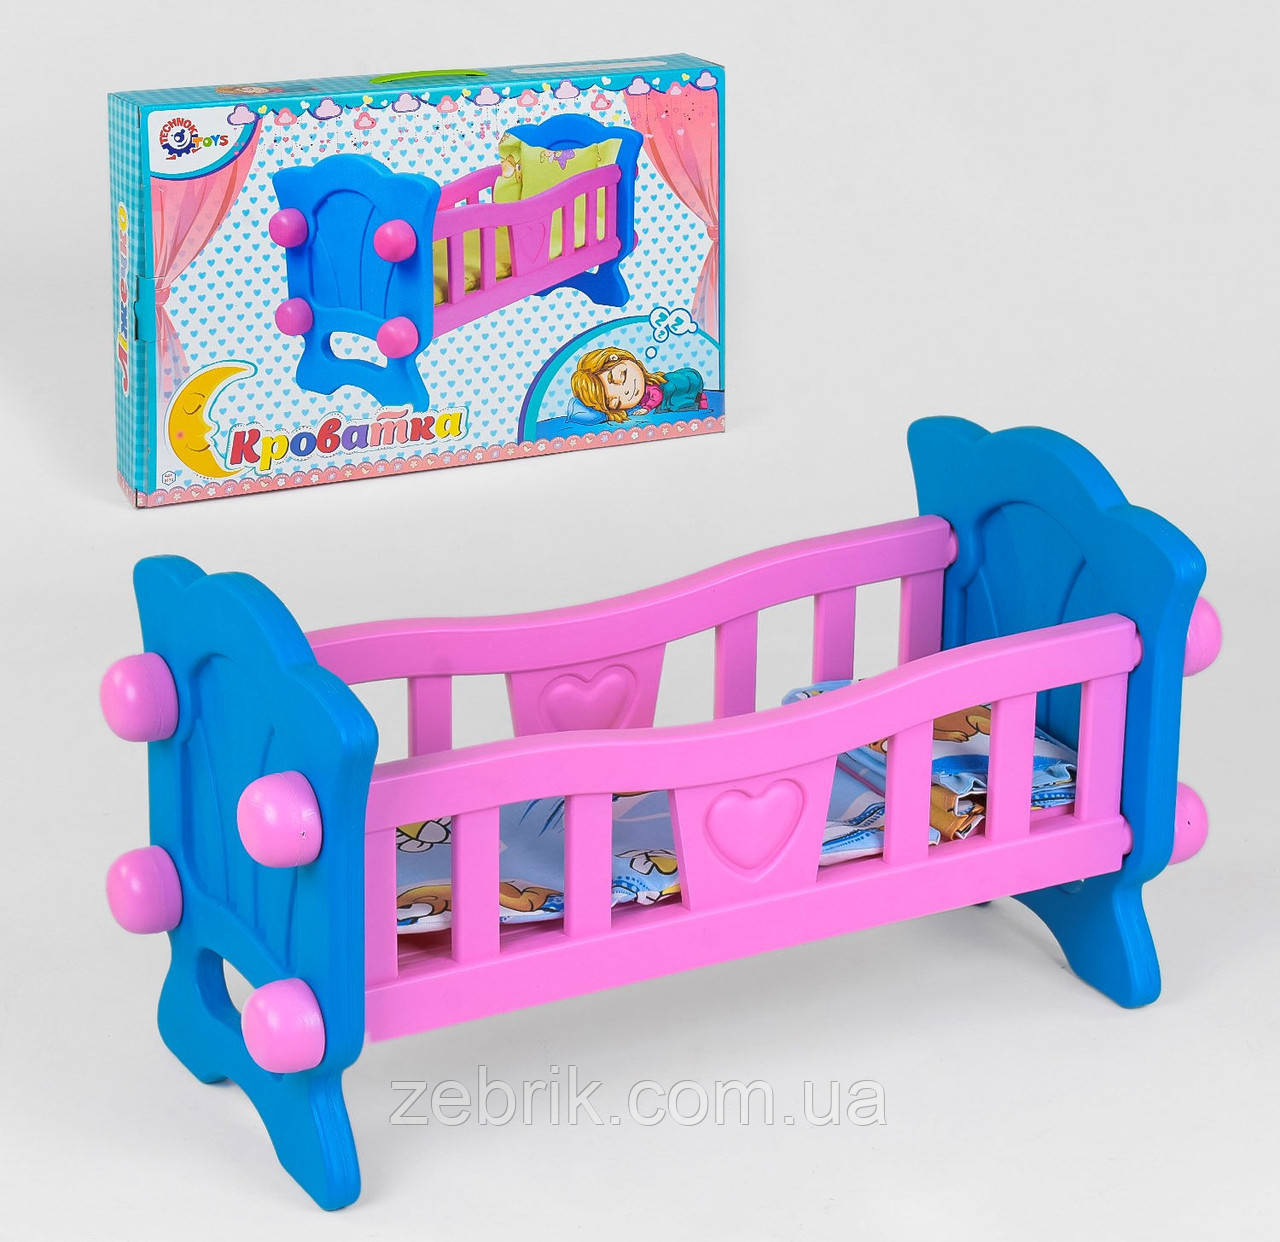 Ліжечко для ляльки/кровать для куклы